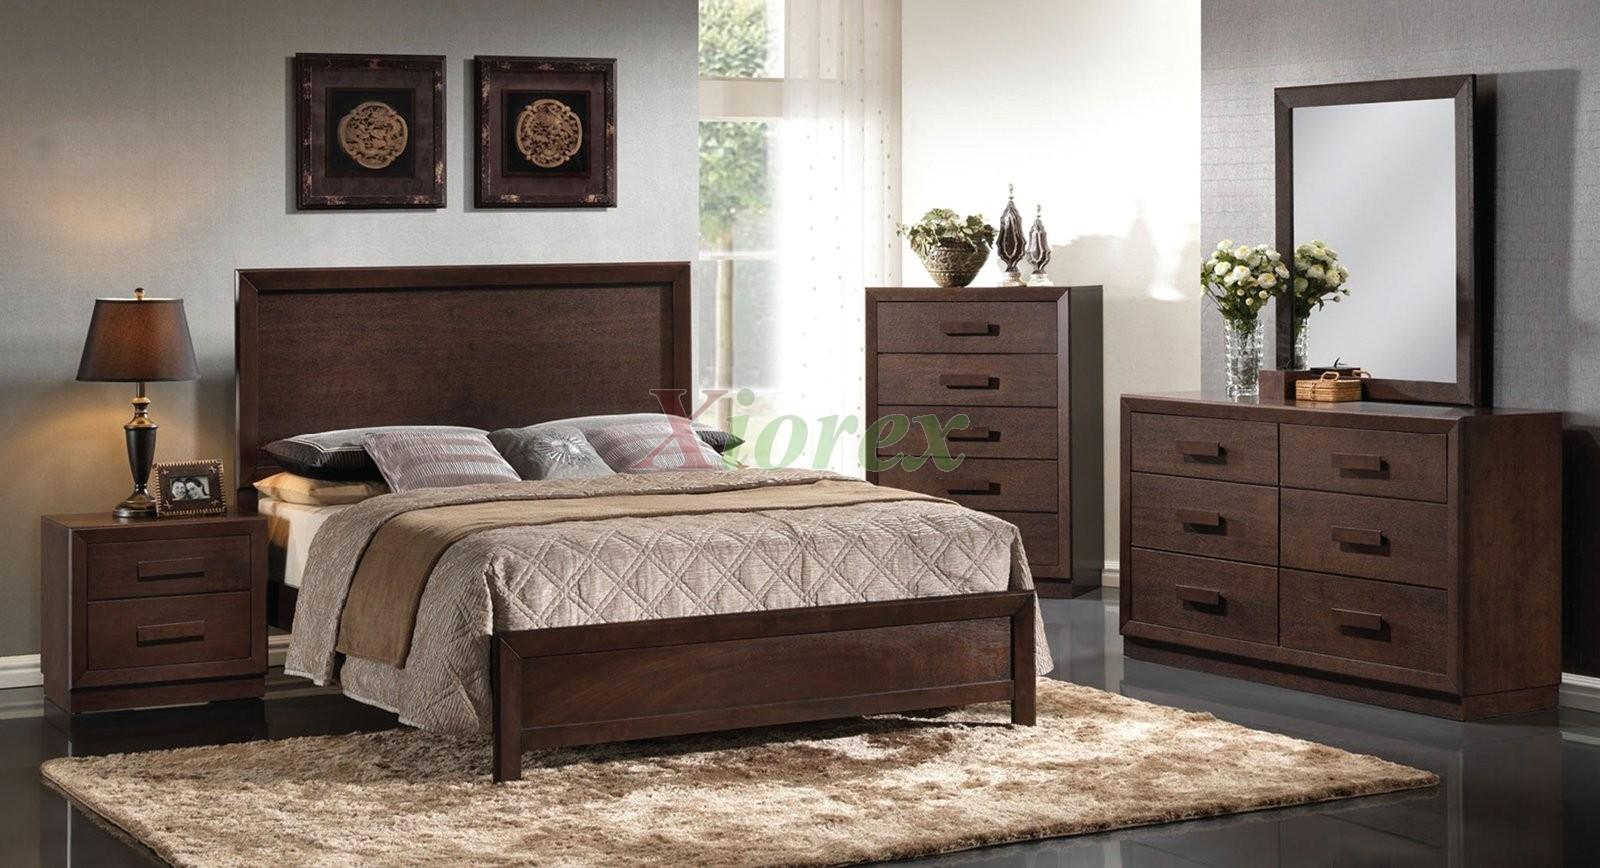 contemporary platform bedroom furniture set 150 xiorex